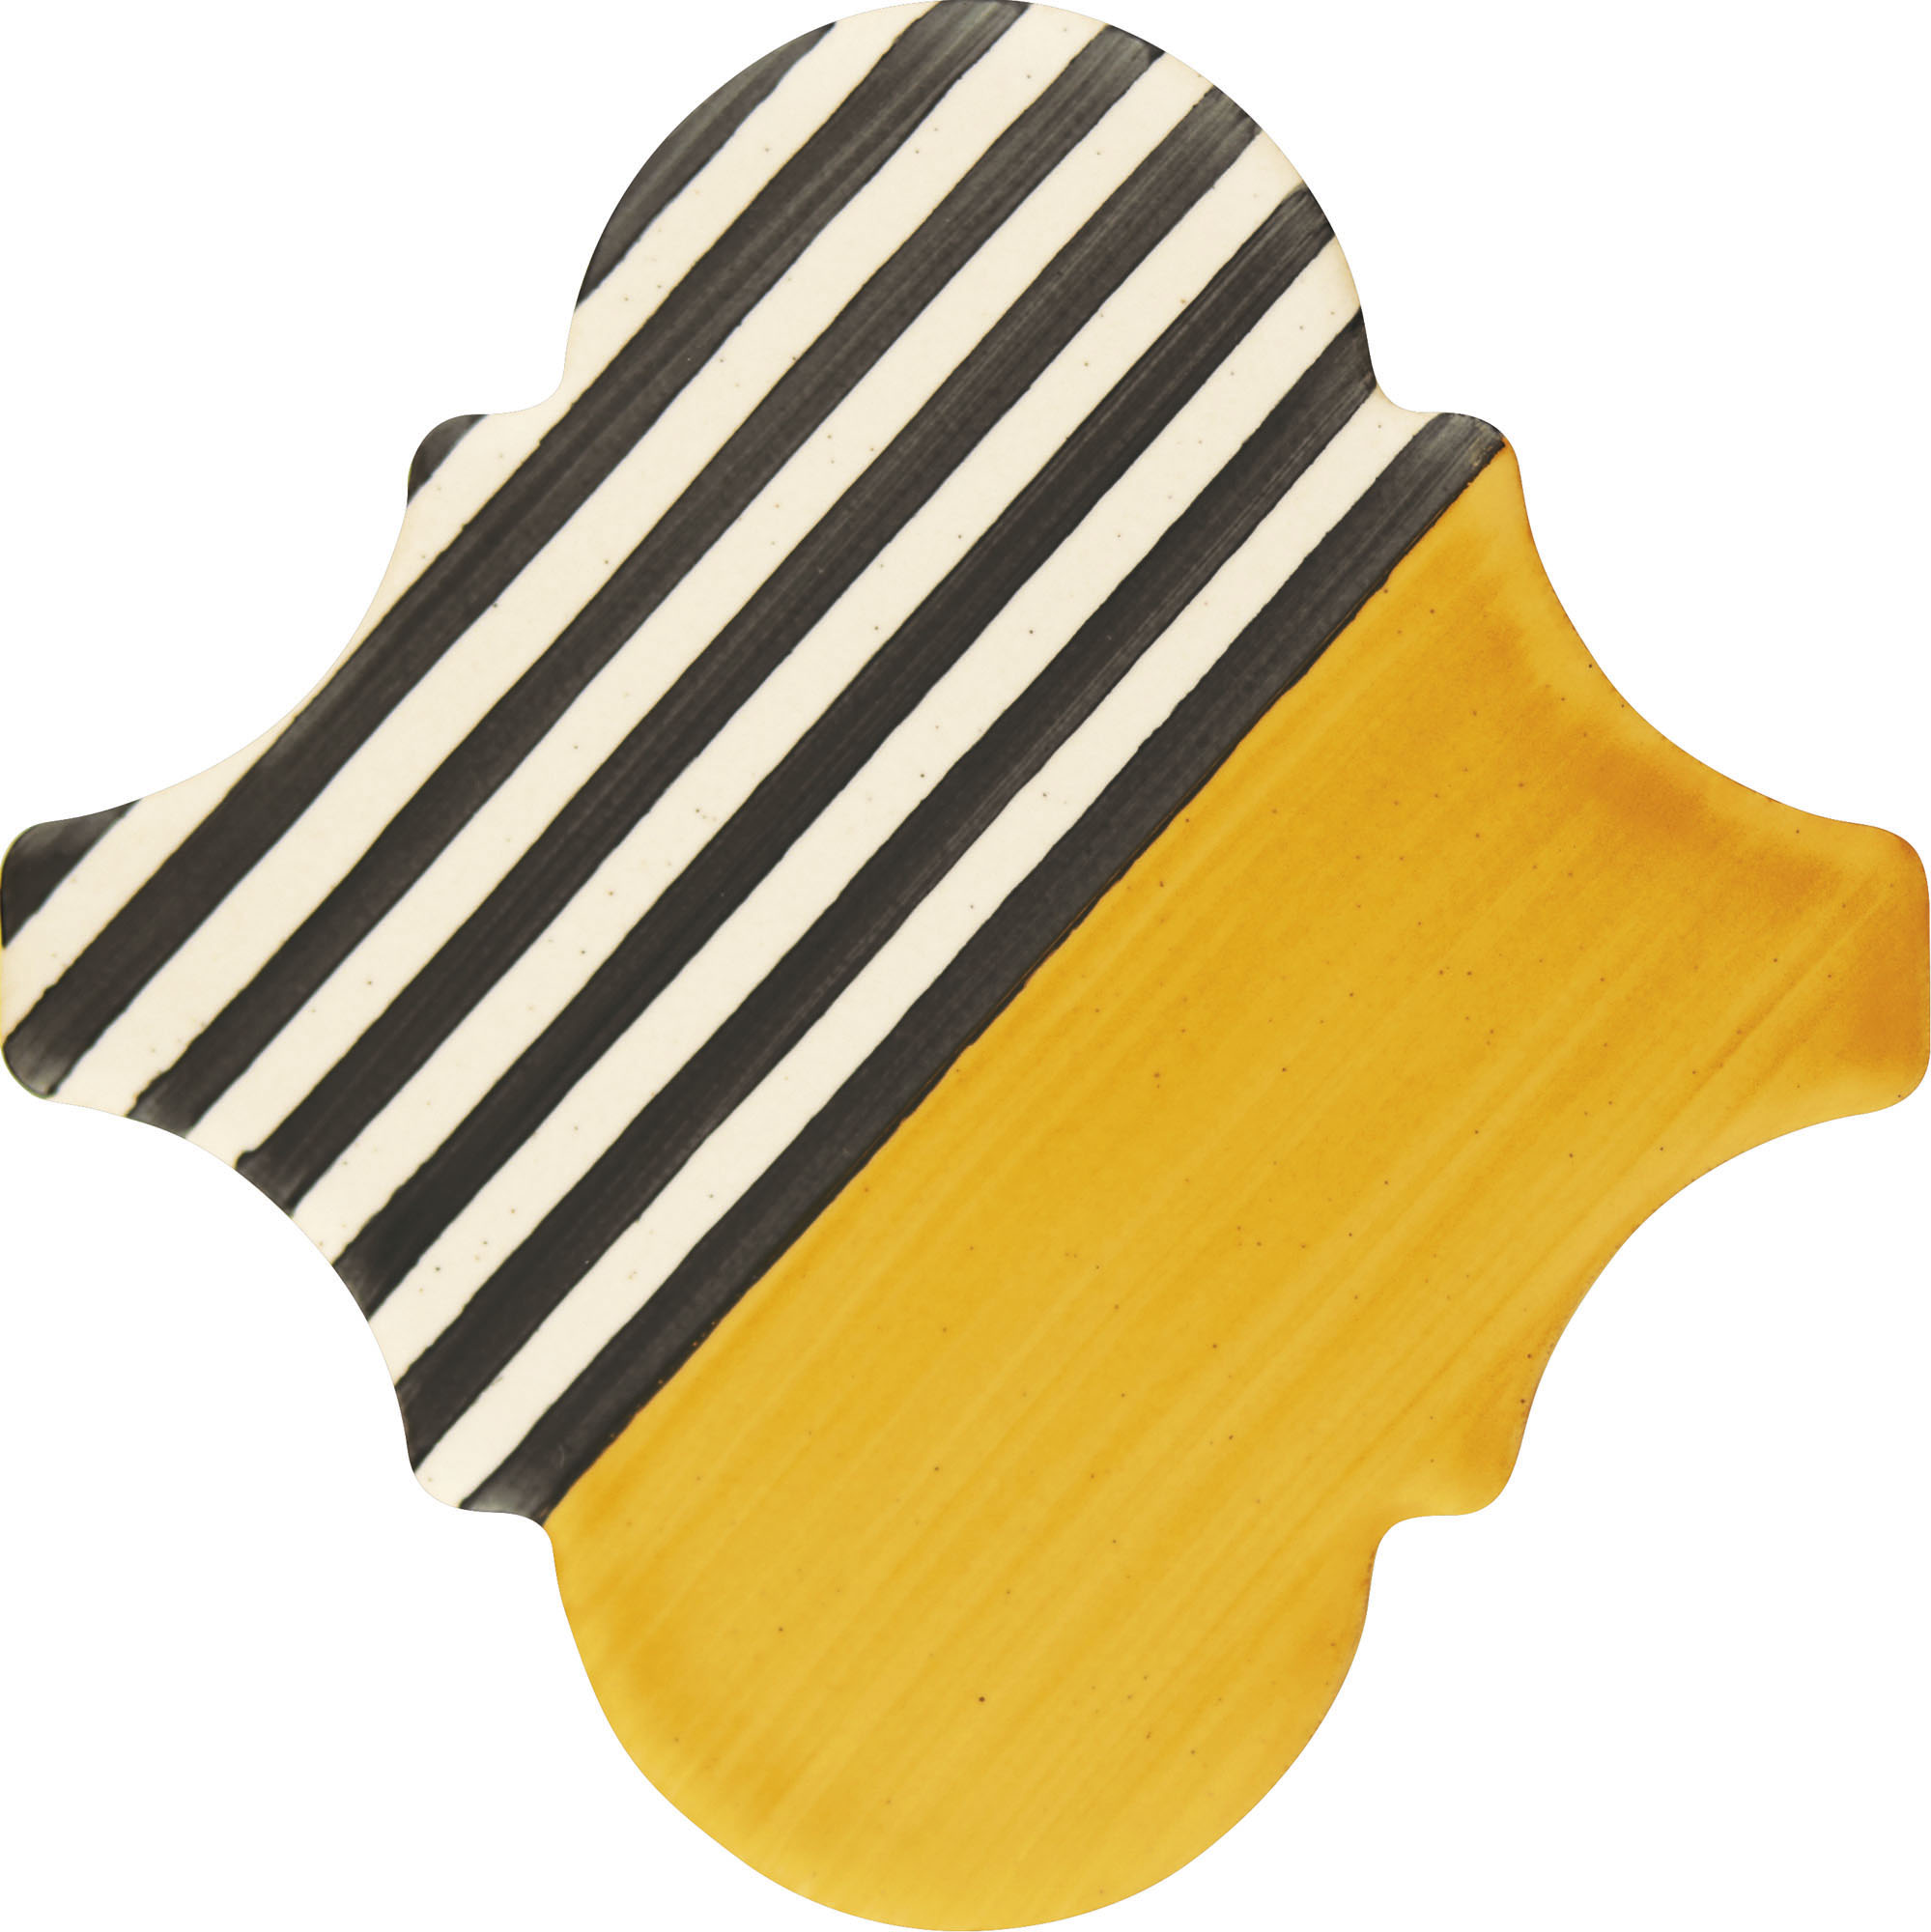 PF008 Color Art Yellow Stripes Arabesque